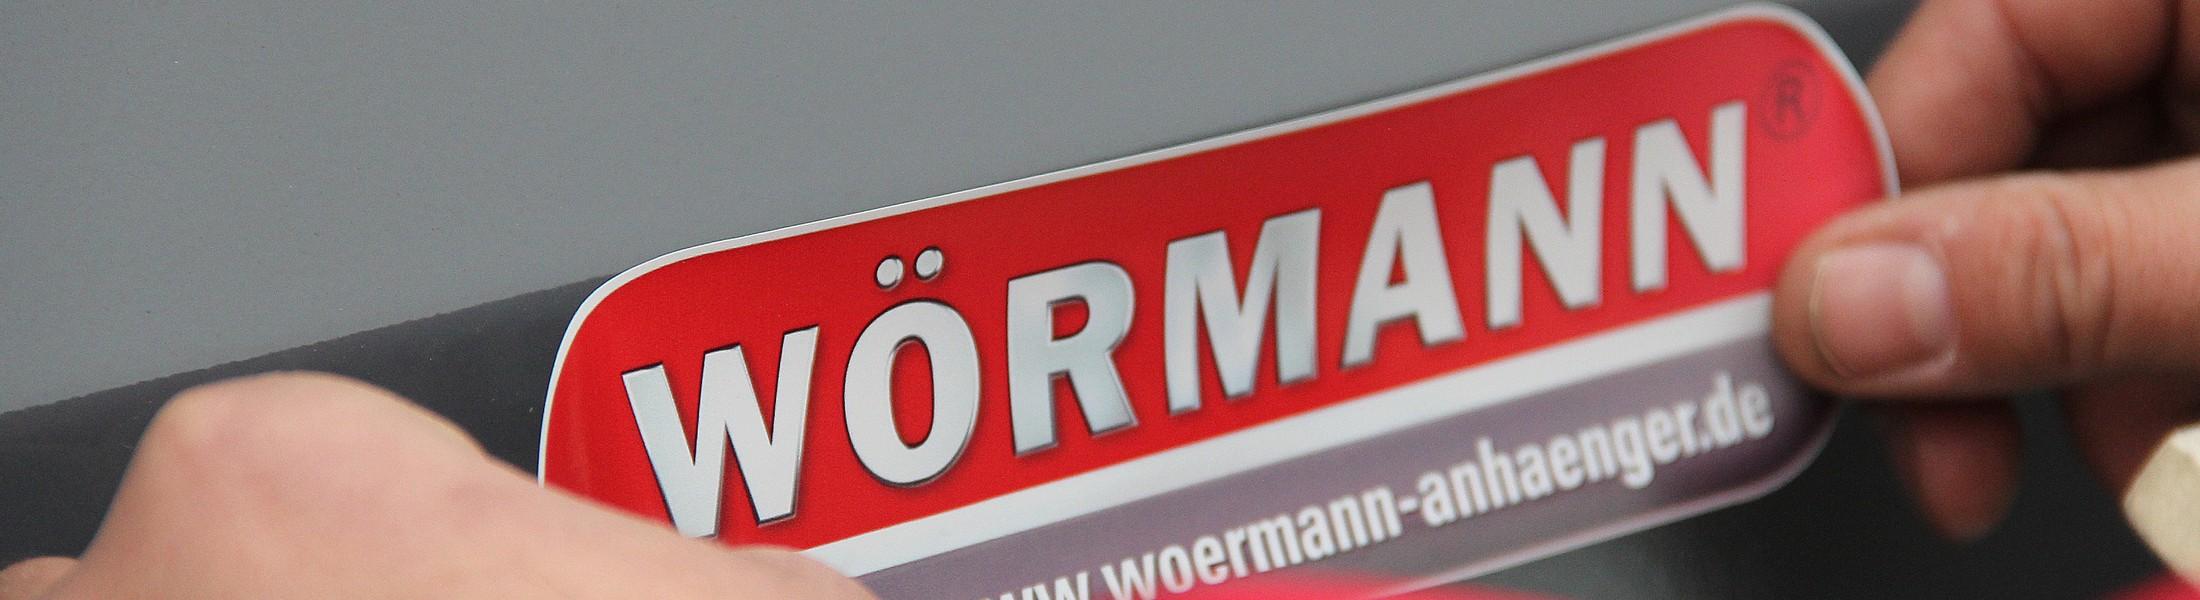 The Brand Wörmann Anhänger Pkw Anhänger Pferdeanhänger